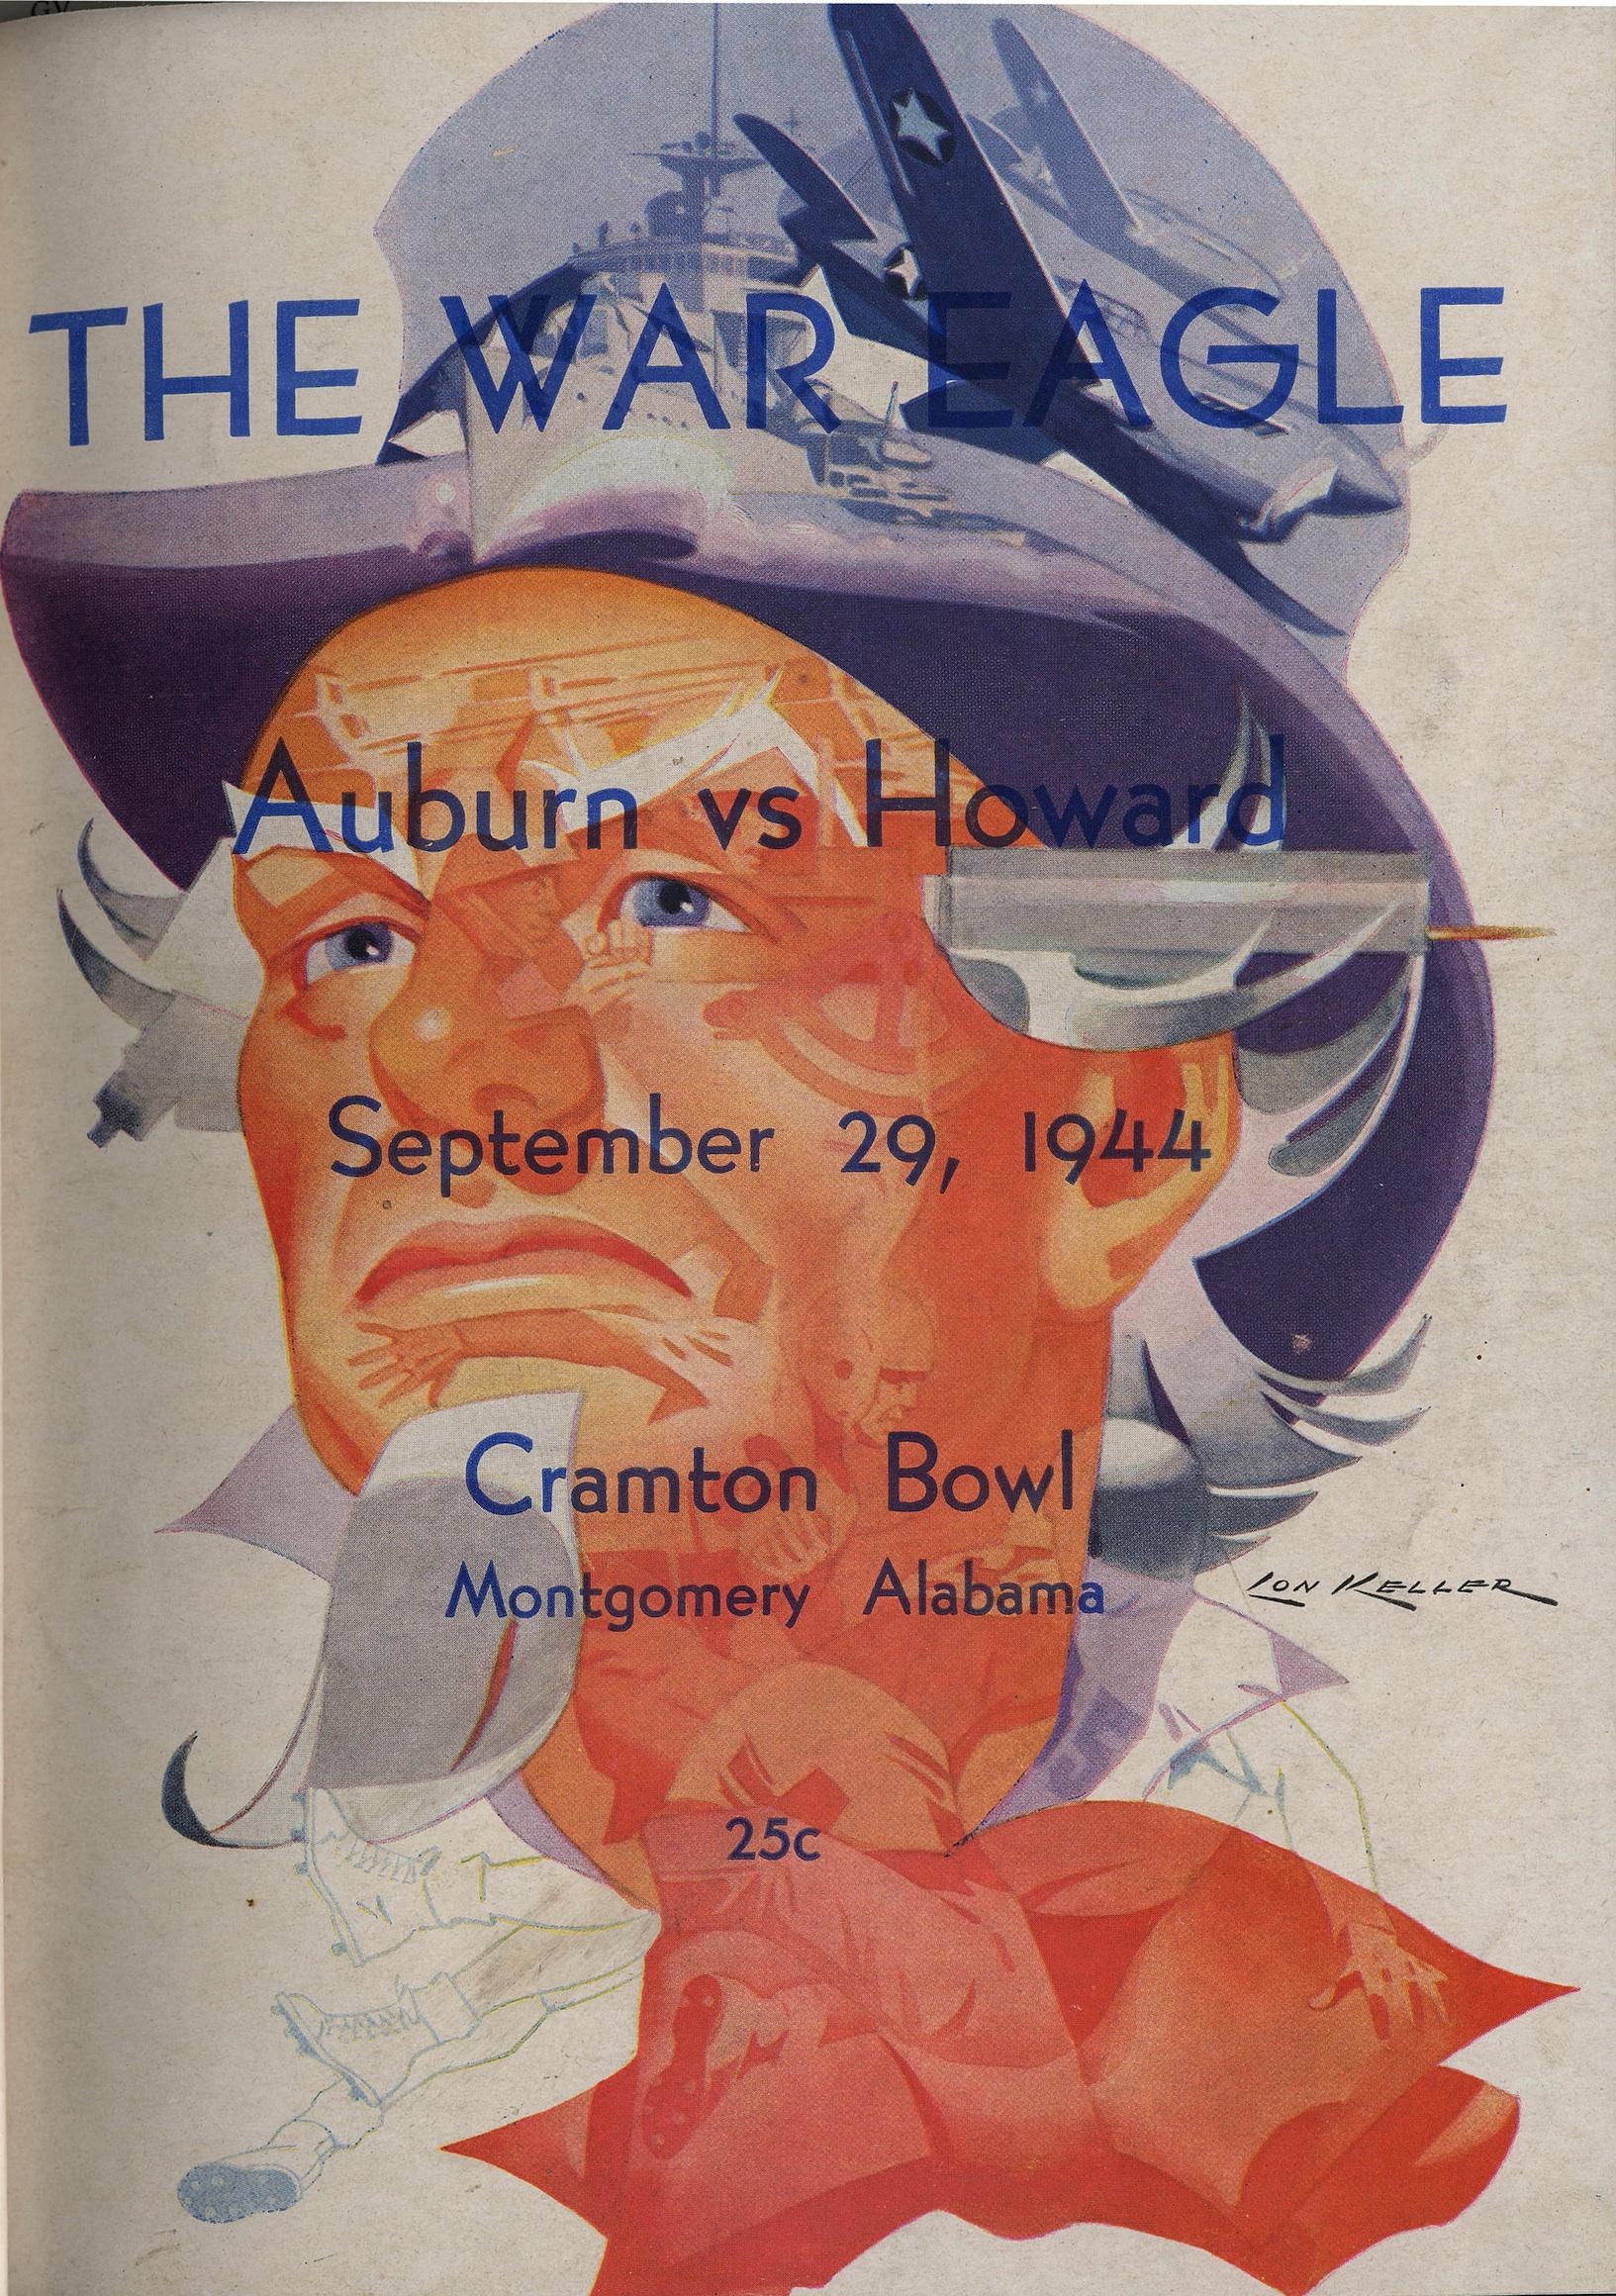 Auburn_vs_Howard_1944 2